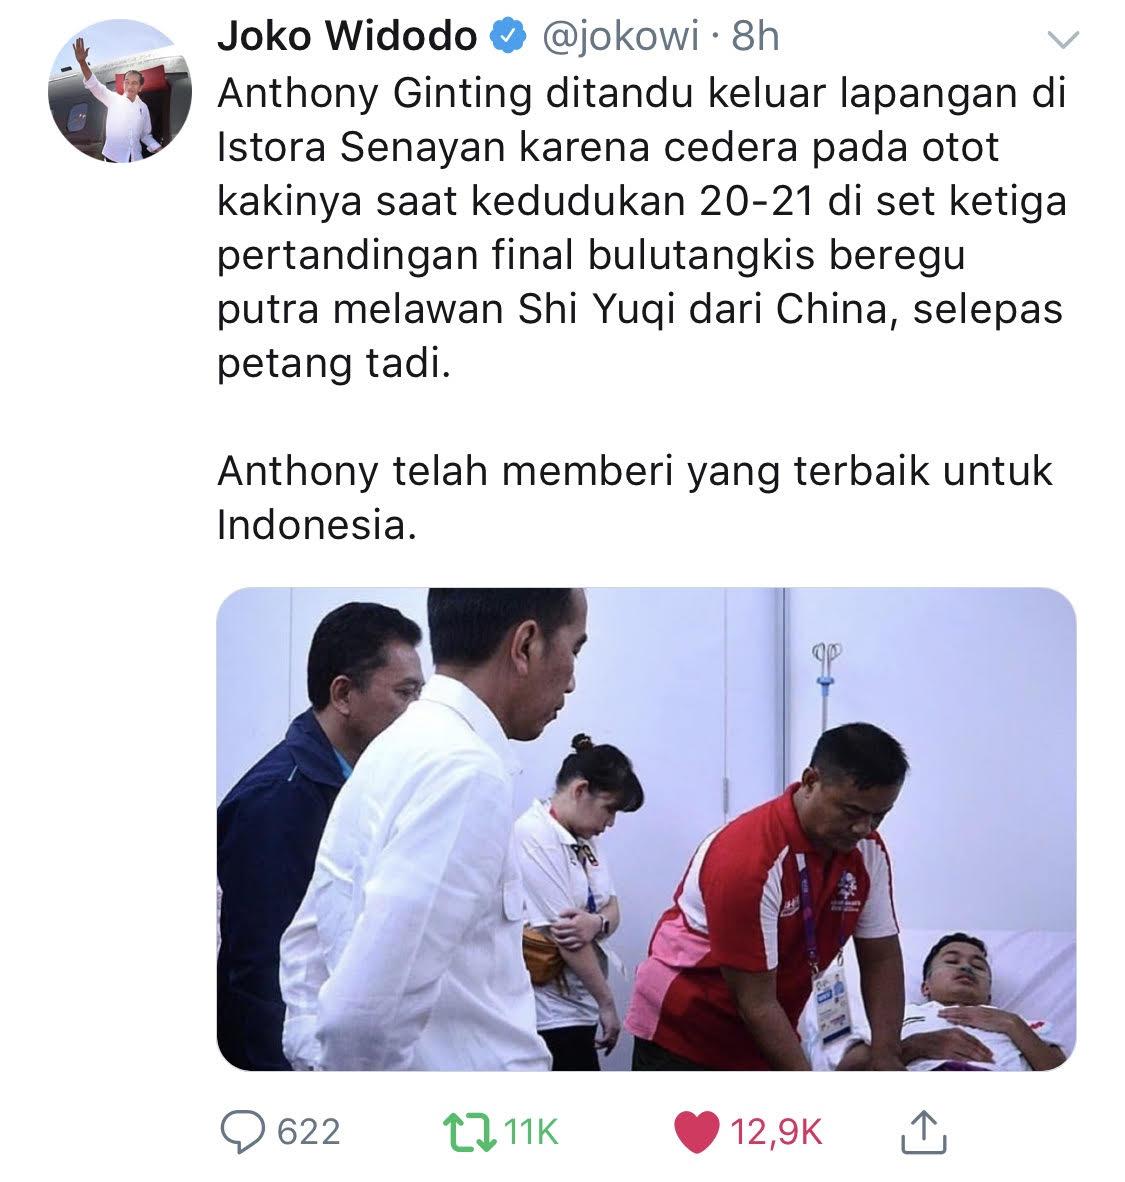 Tweet Jokowi soal Anthony Ginting